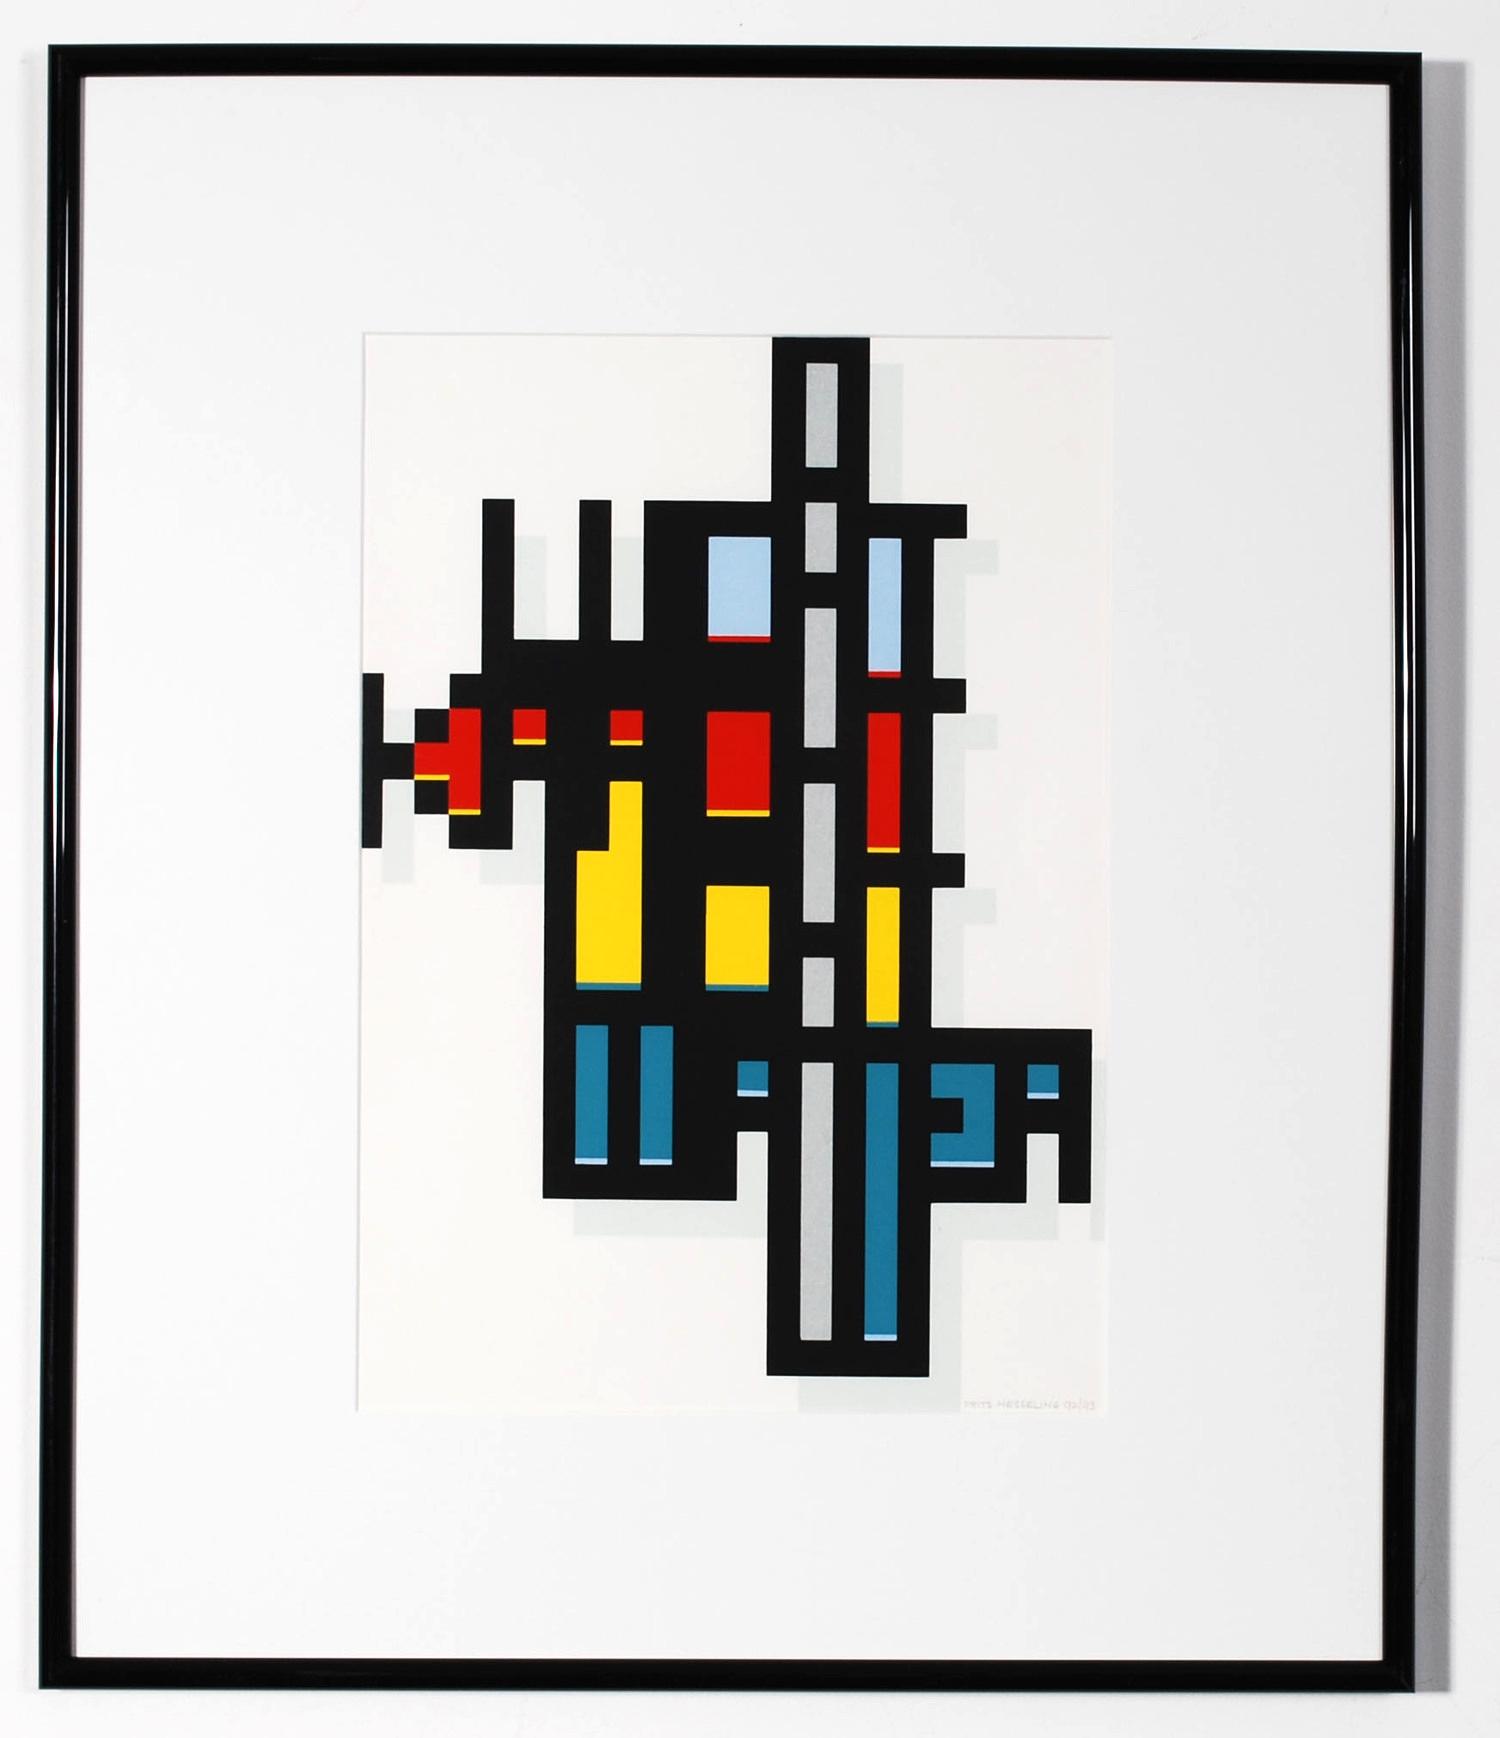 Serigraphy Frits Hesseling, Framed, 92/93